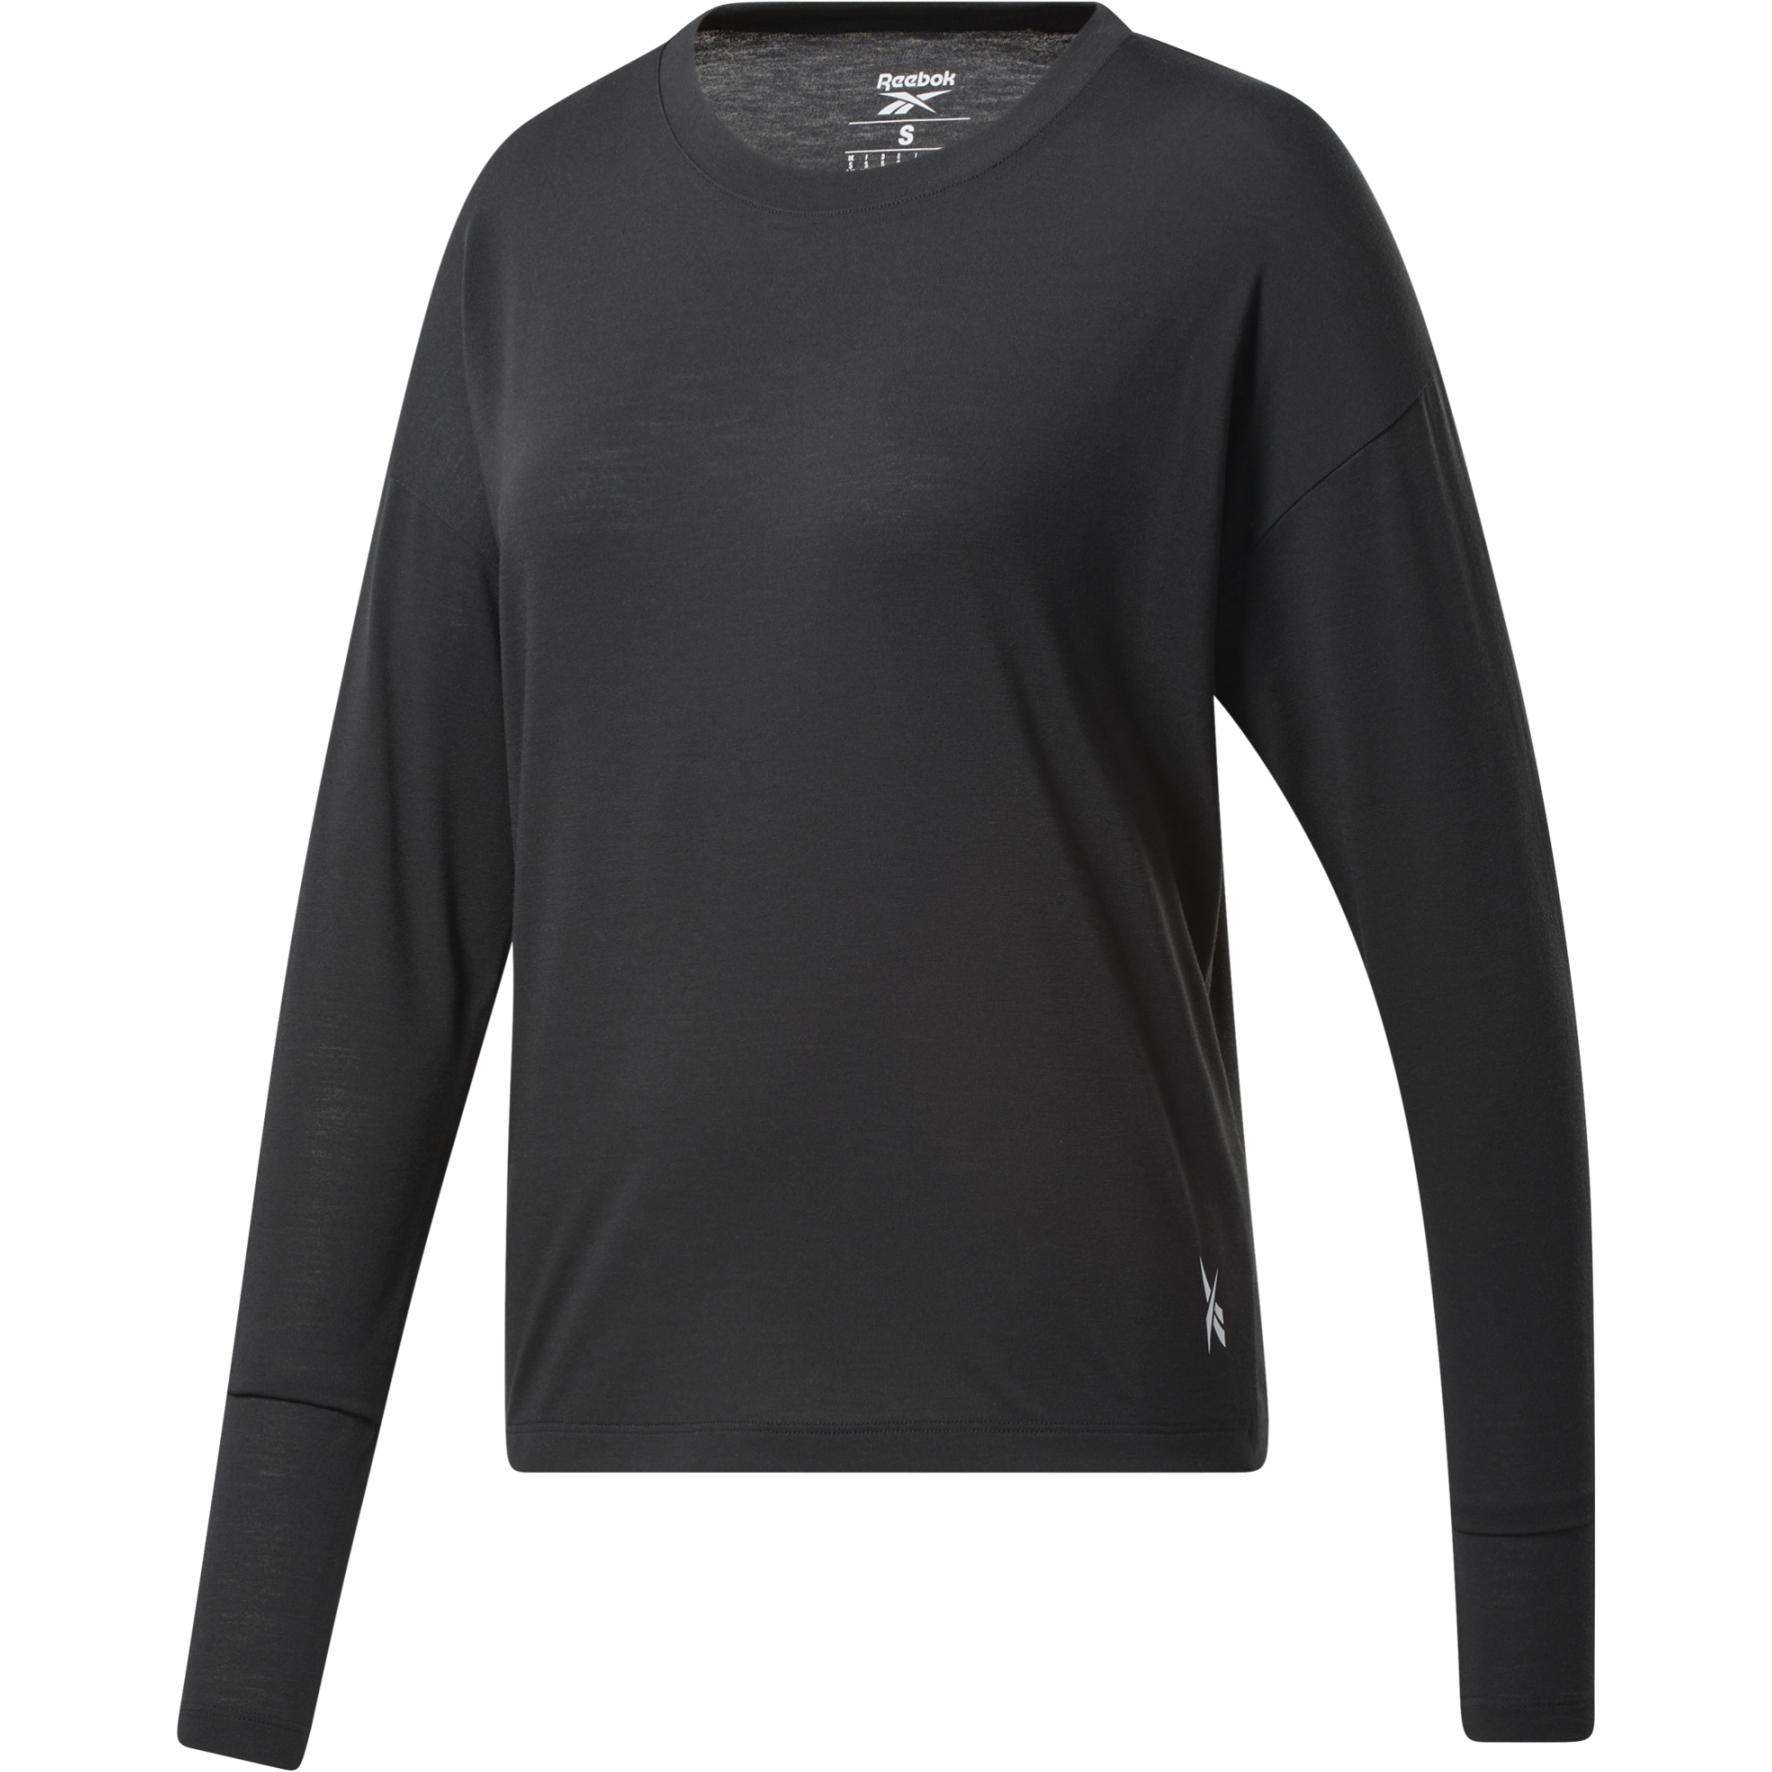 Reebok Workout Ready Supremium Women's Long Sleeve Shirt - night black